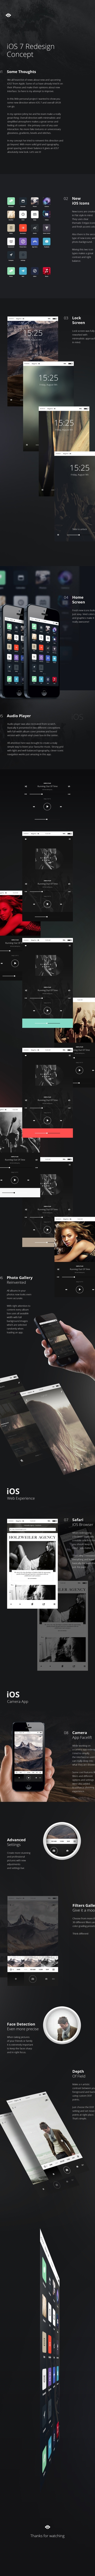 iOS-7-redesign-concept-